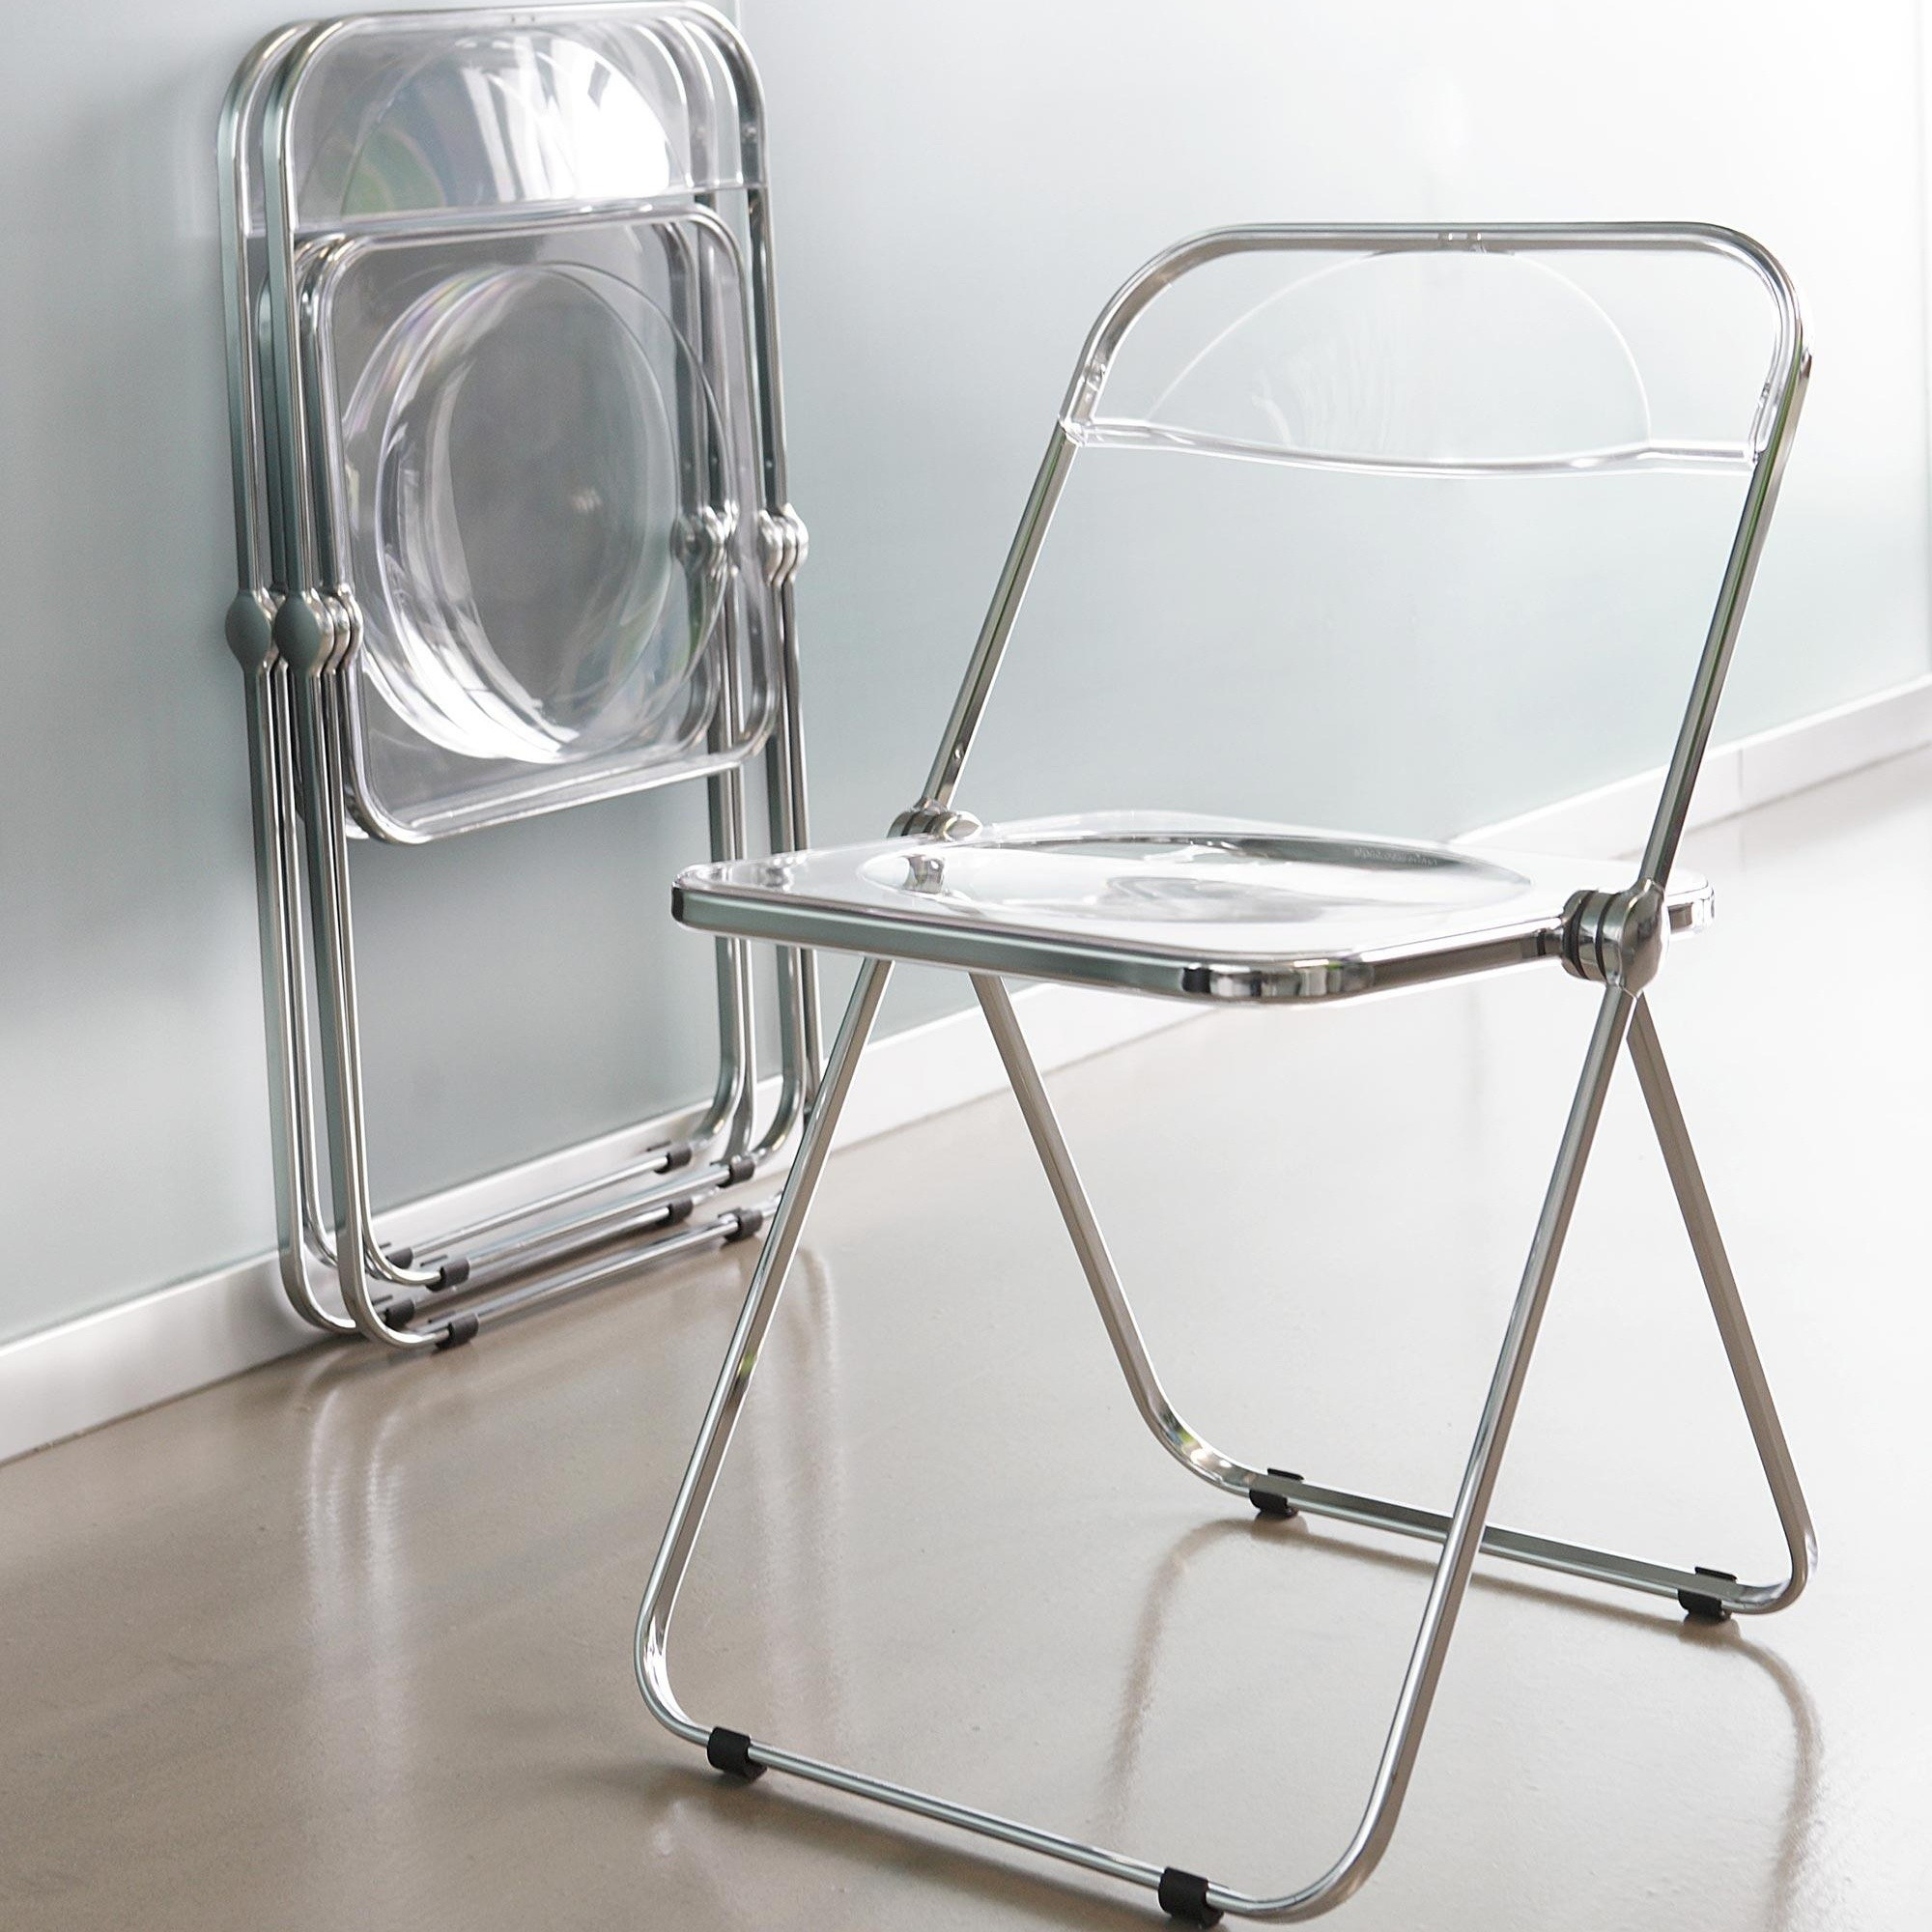 castelli plia chaise pliable ambientedirect. Black Bedroom Furniture Sets. Home Design Ideas